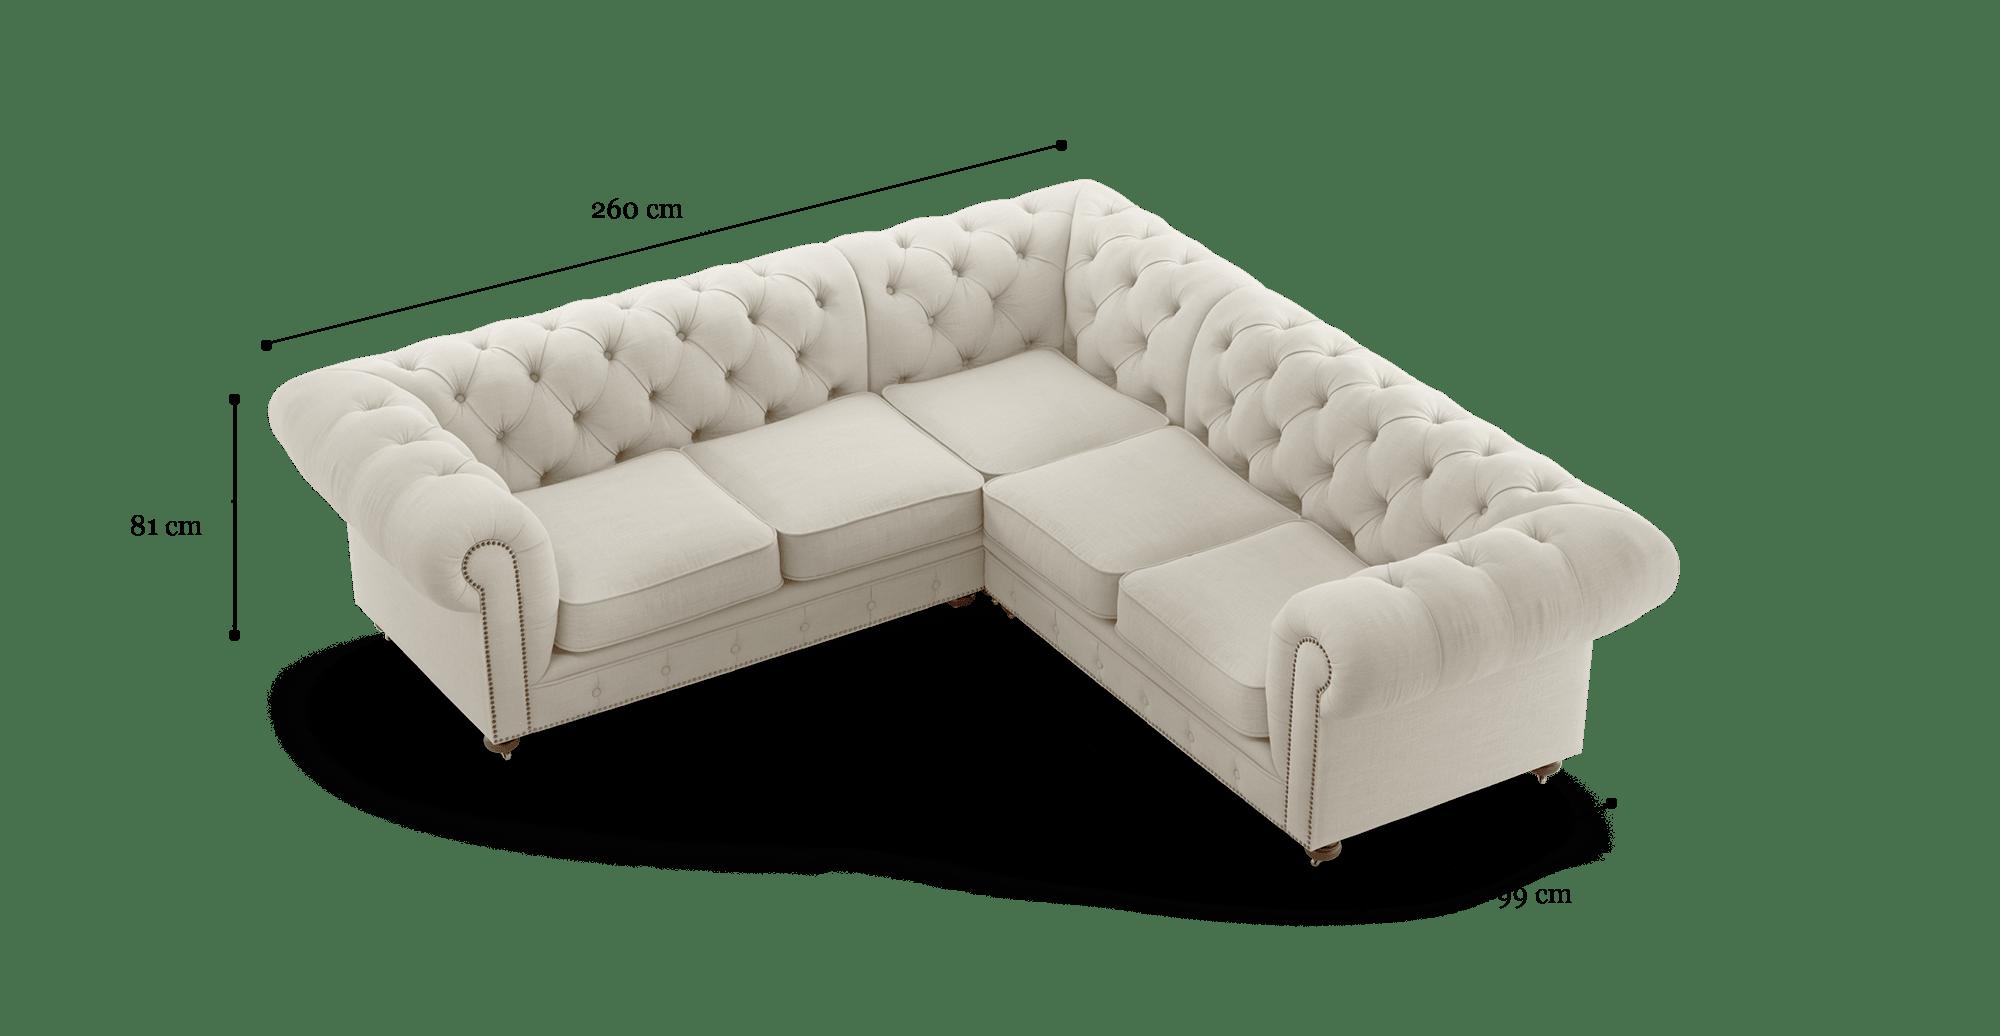 L Shaped Sofa Dimensions In Cm In 2020 L Shaped Sofa Modular Corner Sofa Sofa Dimension